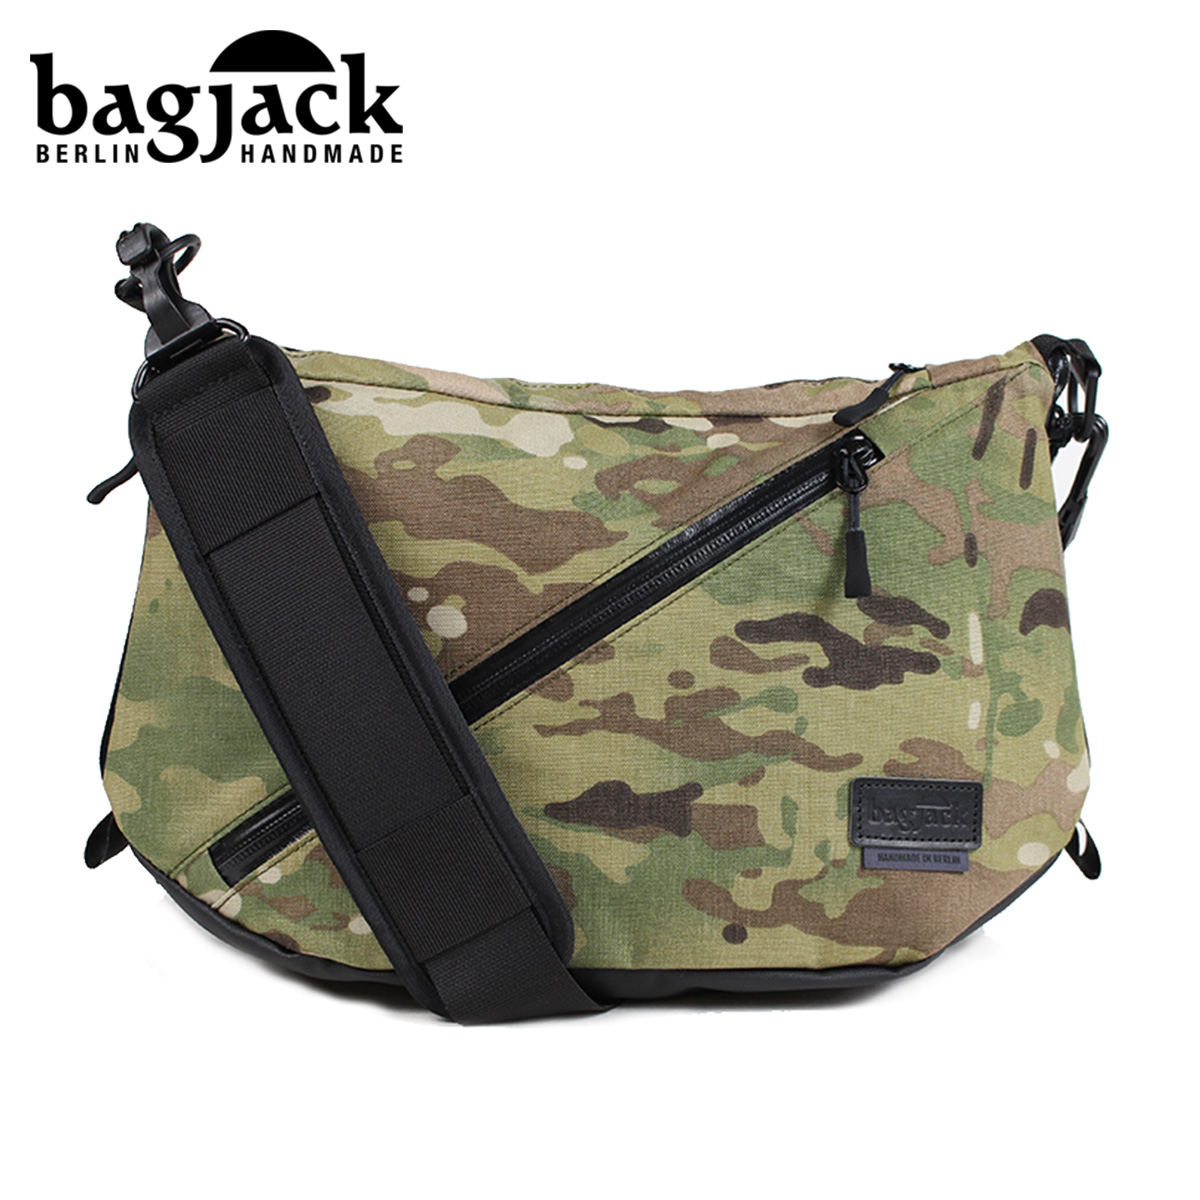 bagjack NEXT LEVEL TECH-LINE TCL SNIPER BAG バッグジャック メッセンジャーバッグ ショルダーバッグ メンズ レディース マルチカモ